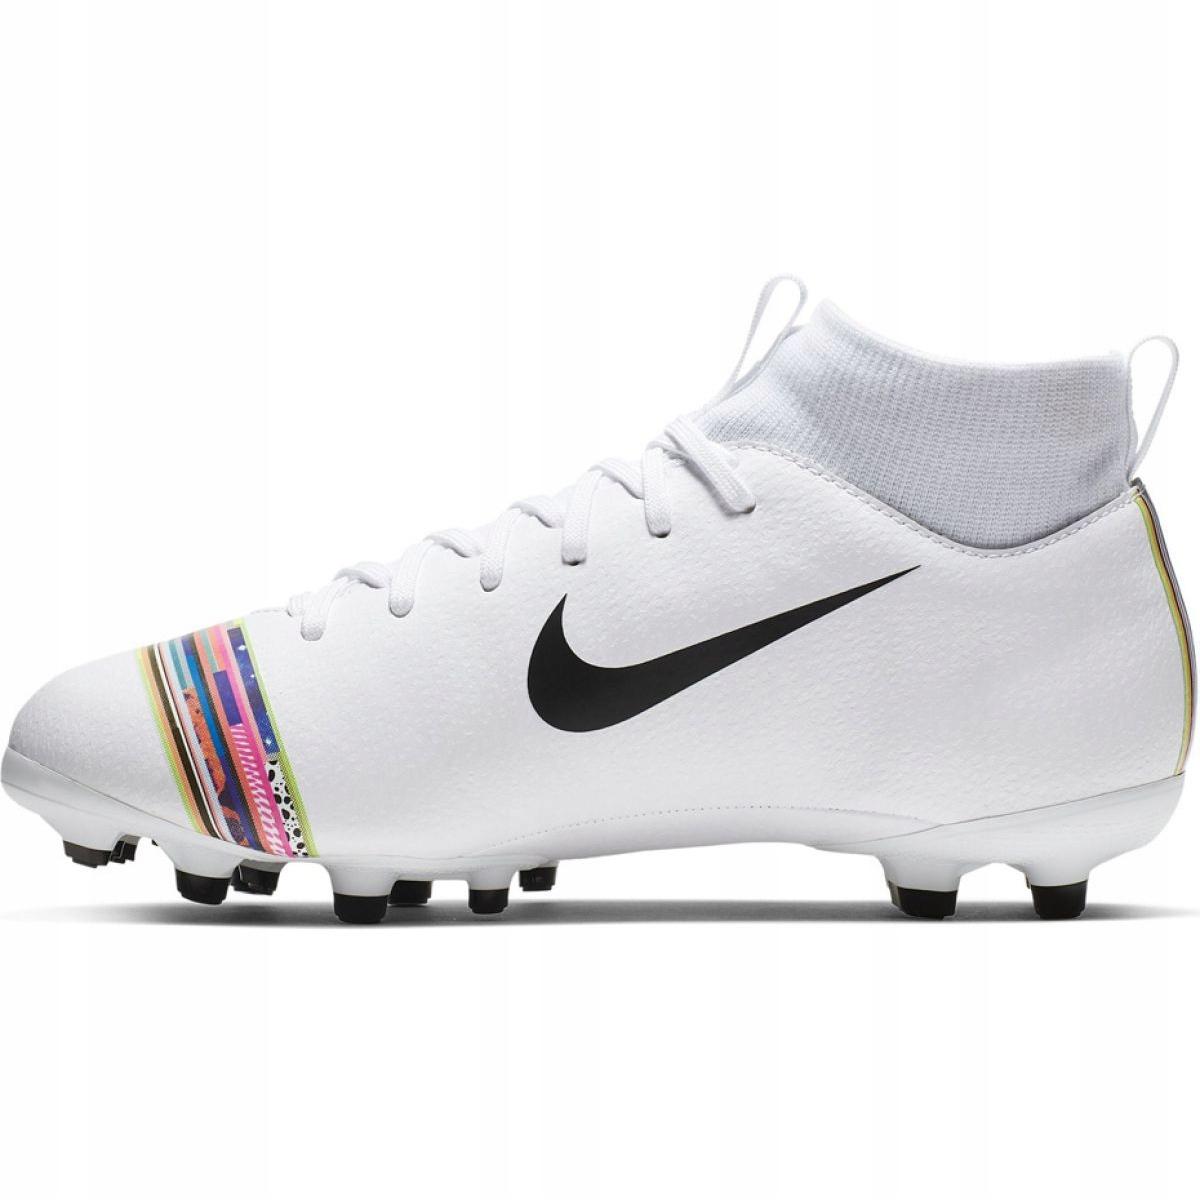 cipő Futball Nike Mercurial Superfly 6 Academy FGMG M AH7362 801